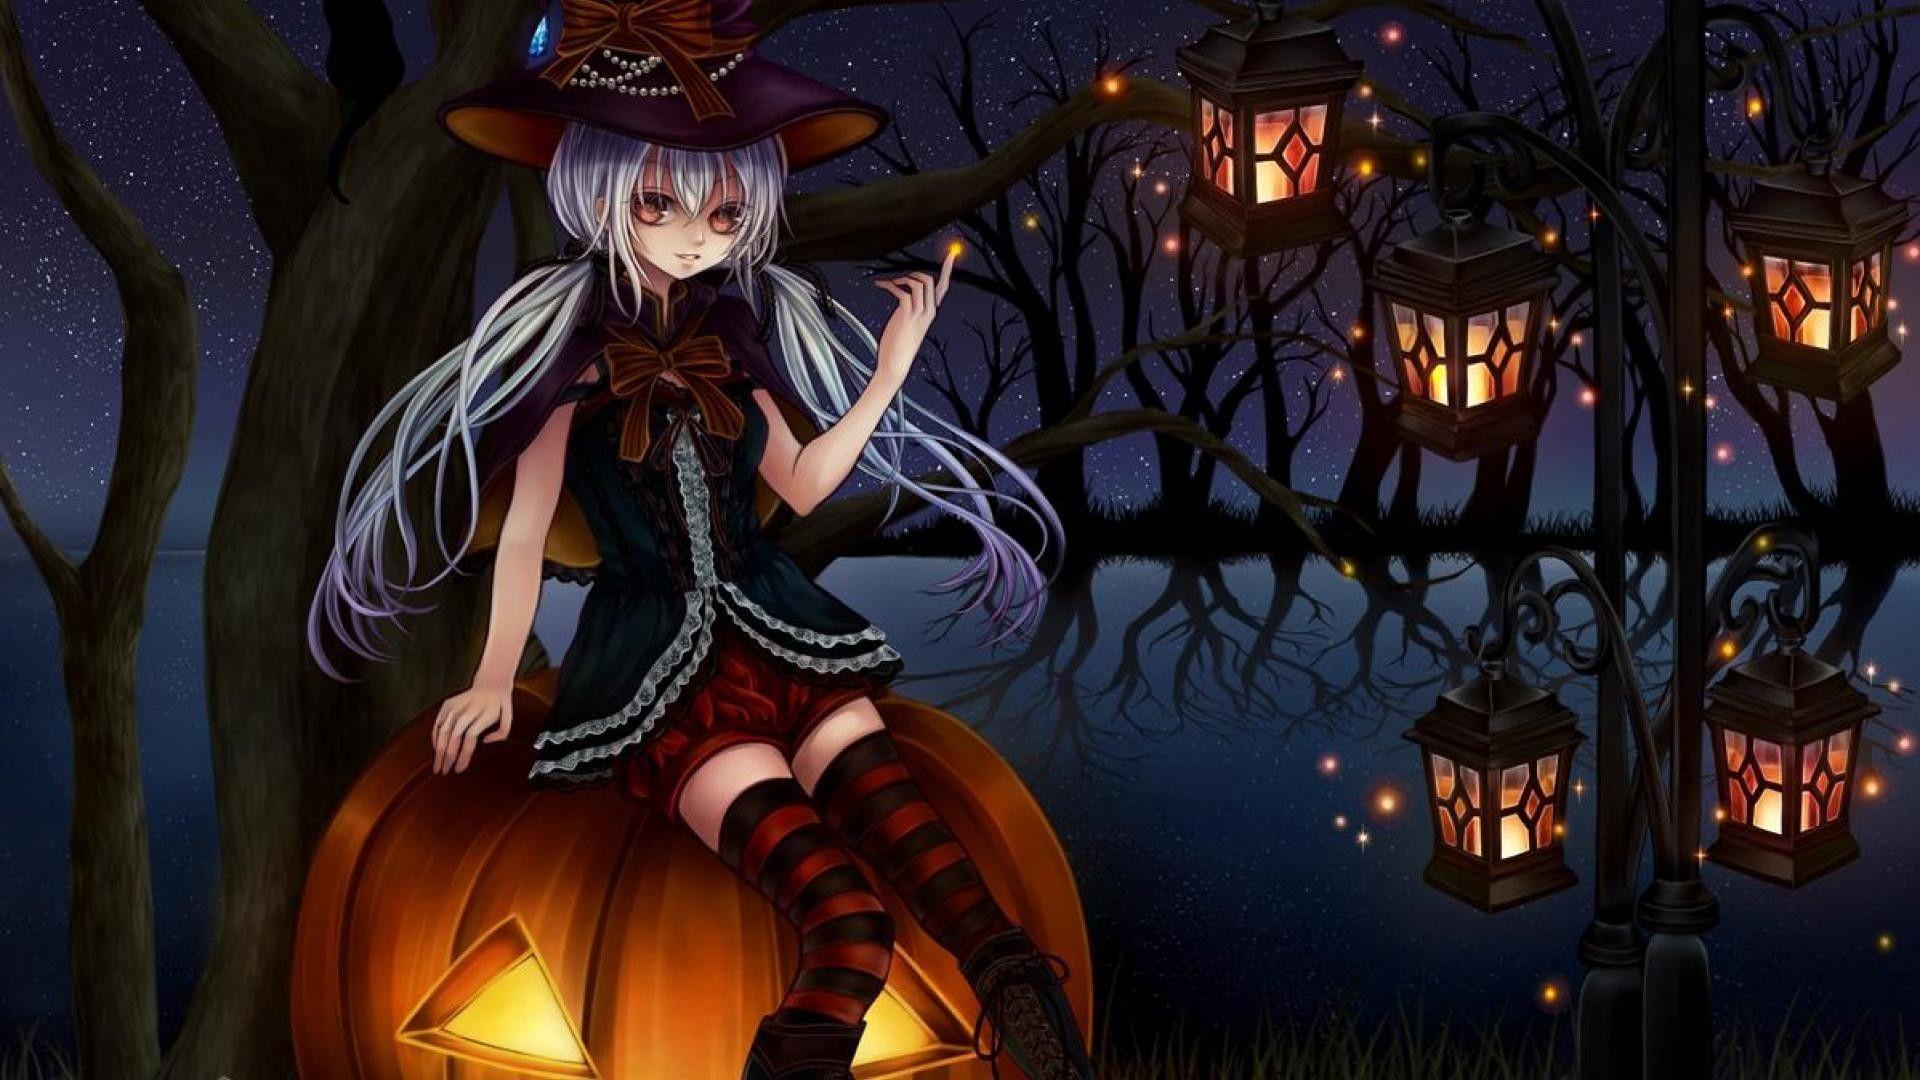 Anime Halloween Wallpapers - Top Free Anime Halloween Backgrounds